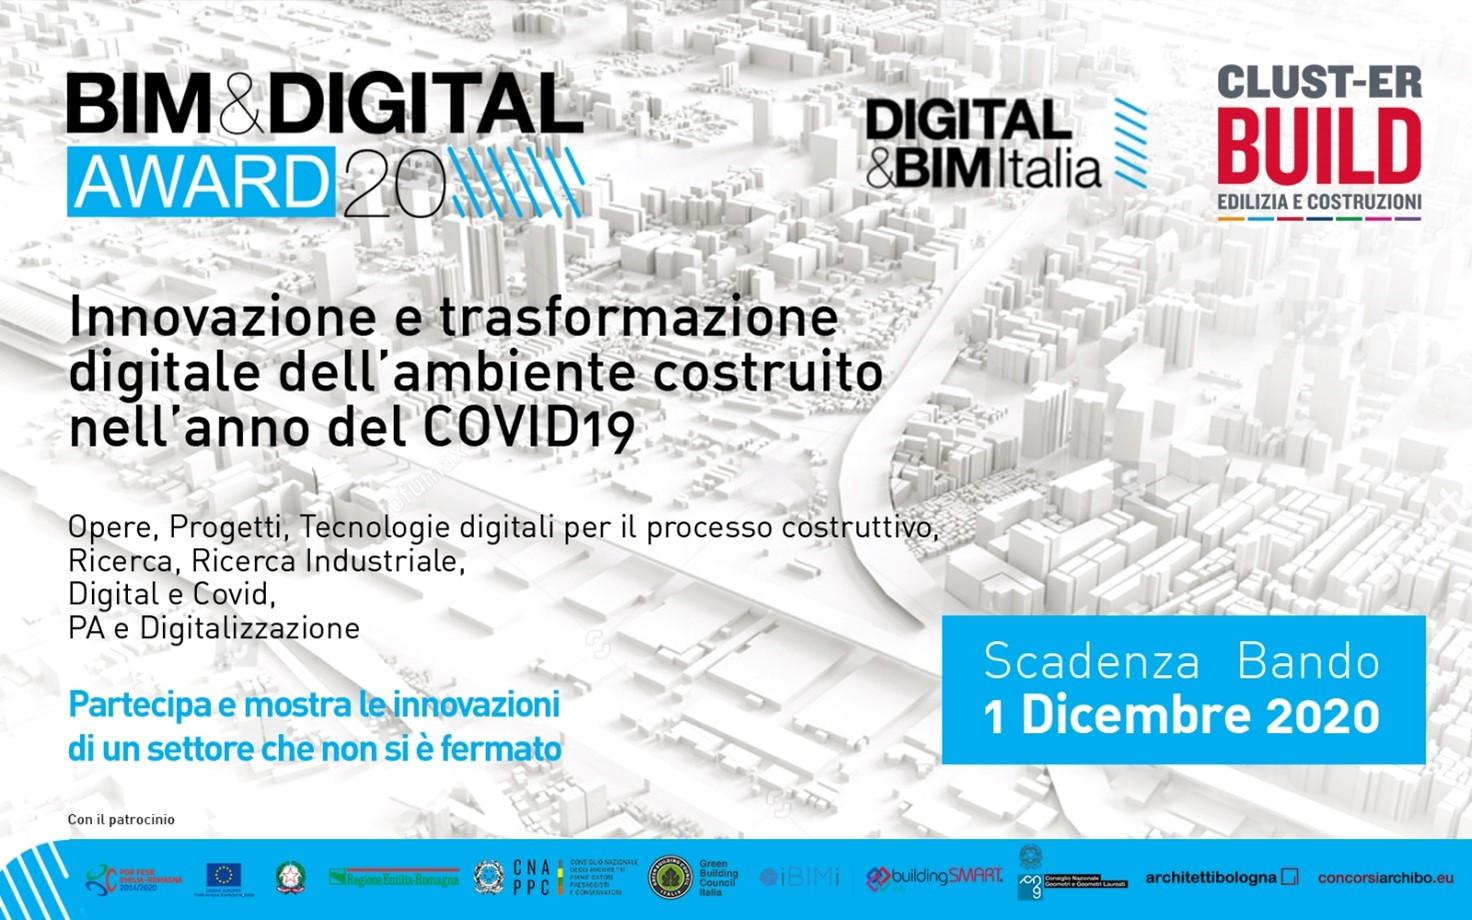 digital&BIM award